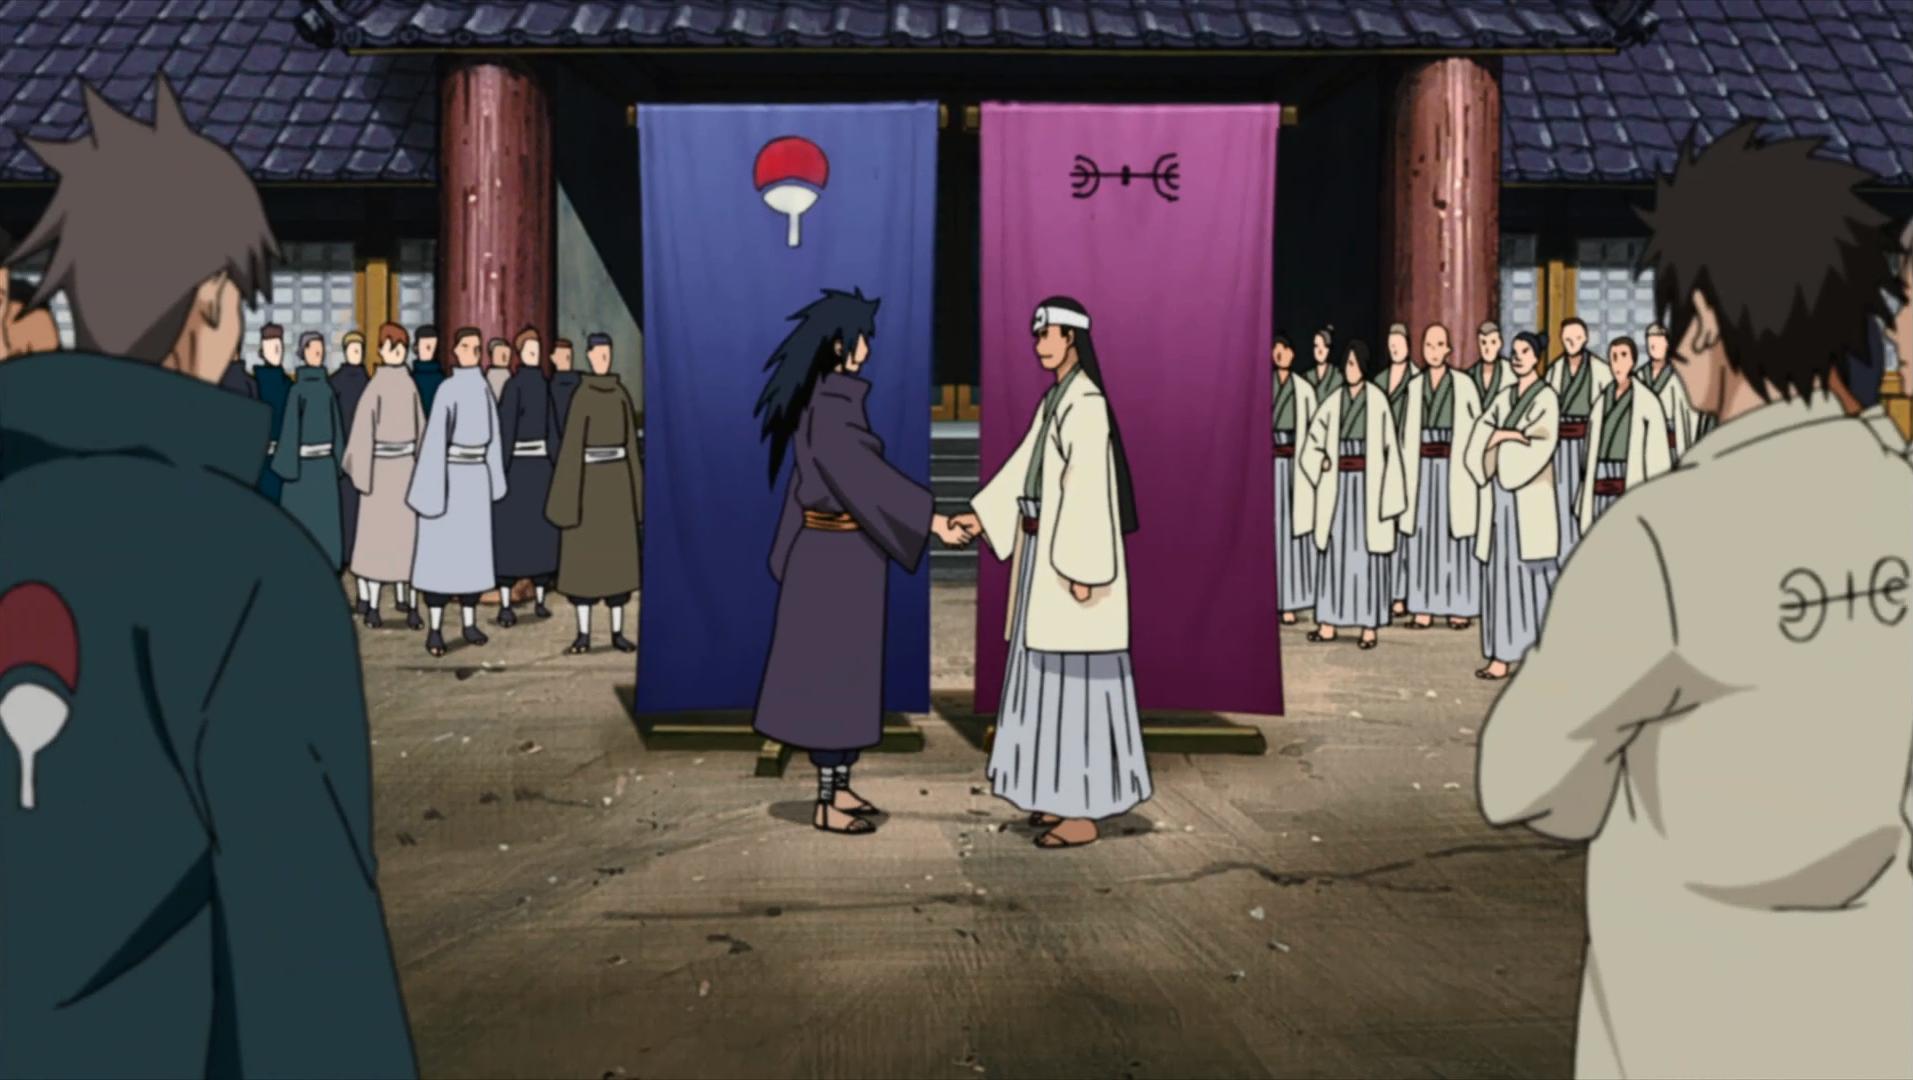 Uchiha Family The Senju and Uchiha form an